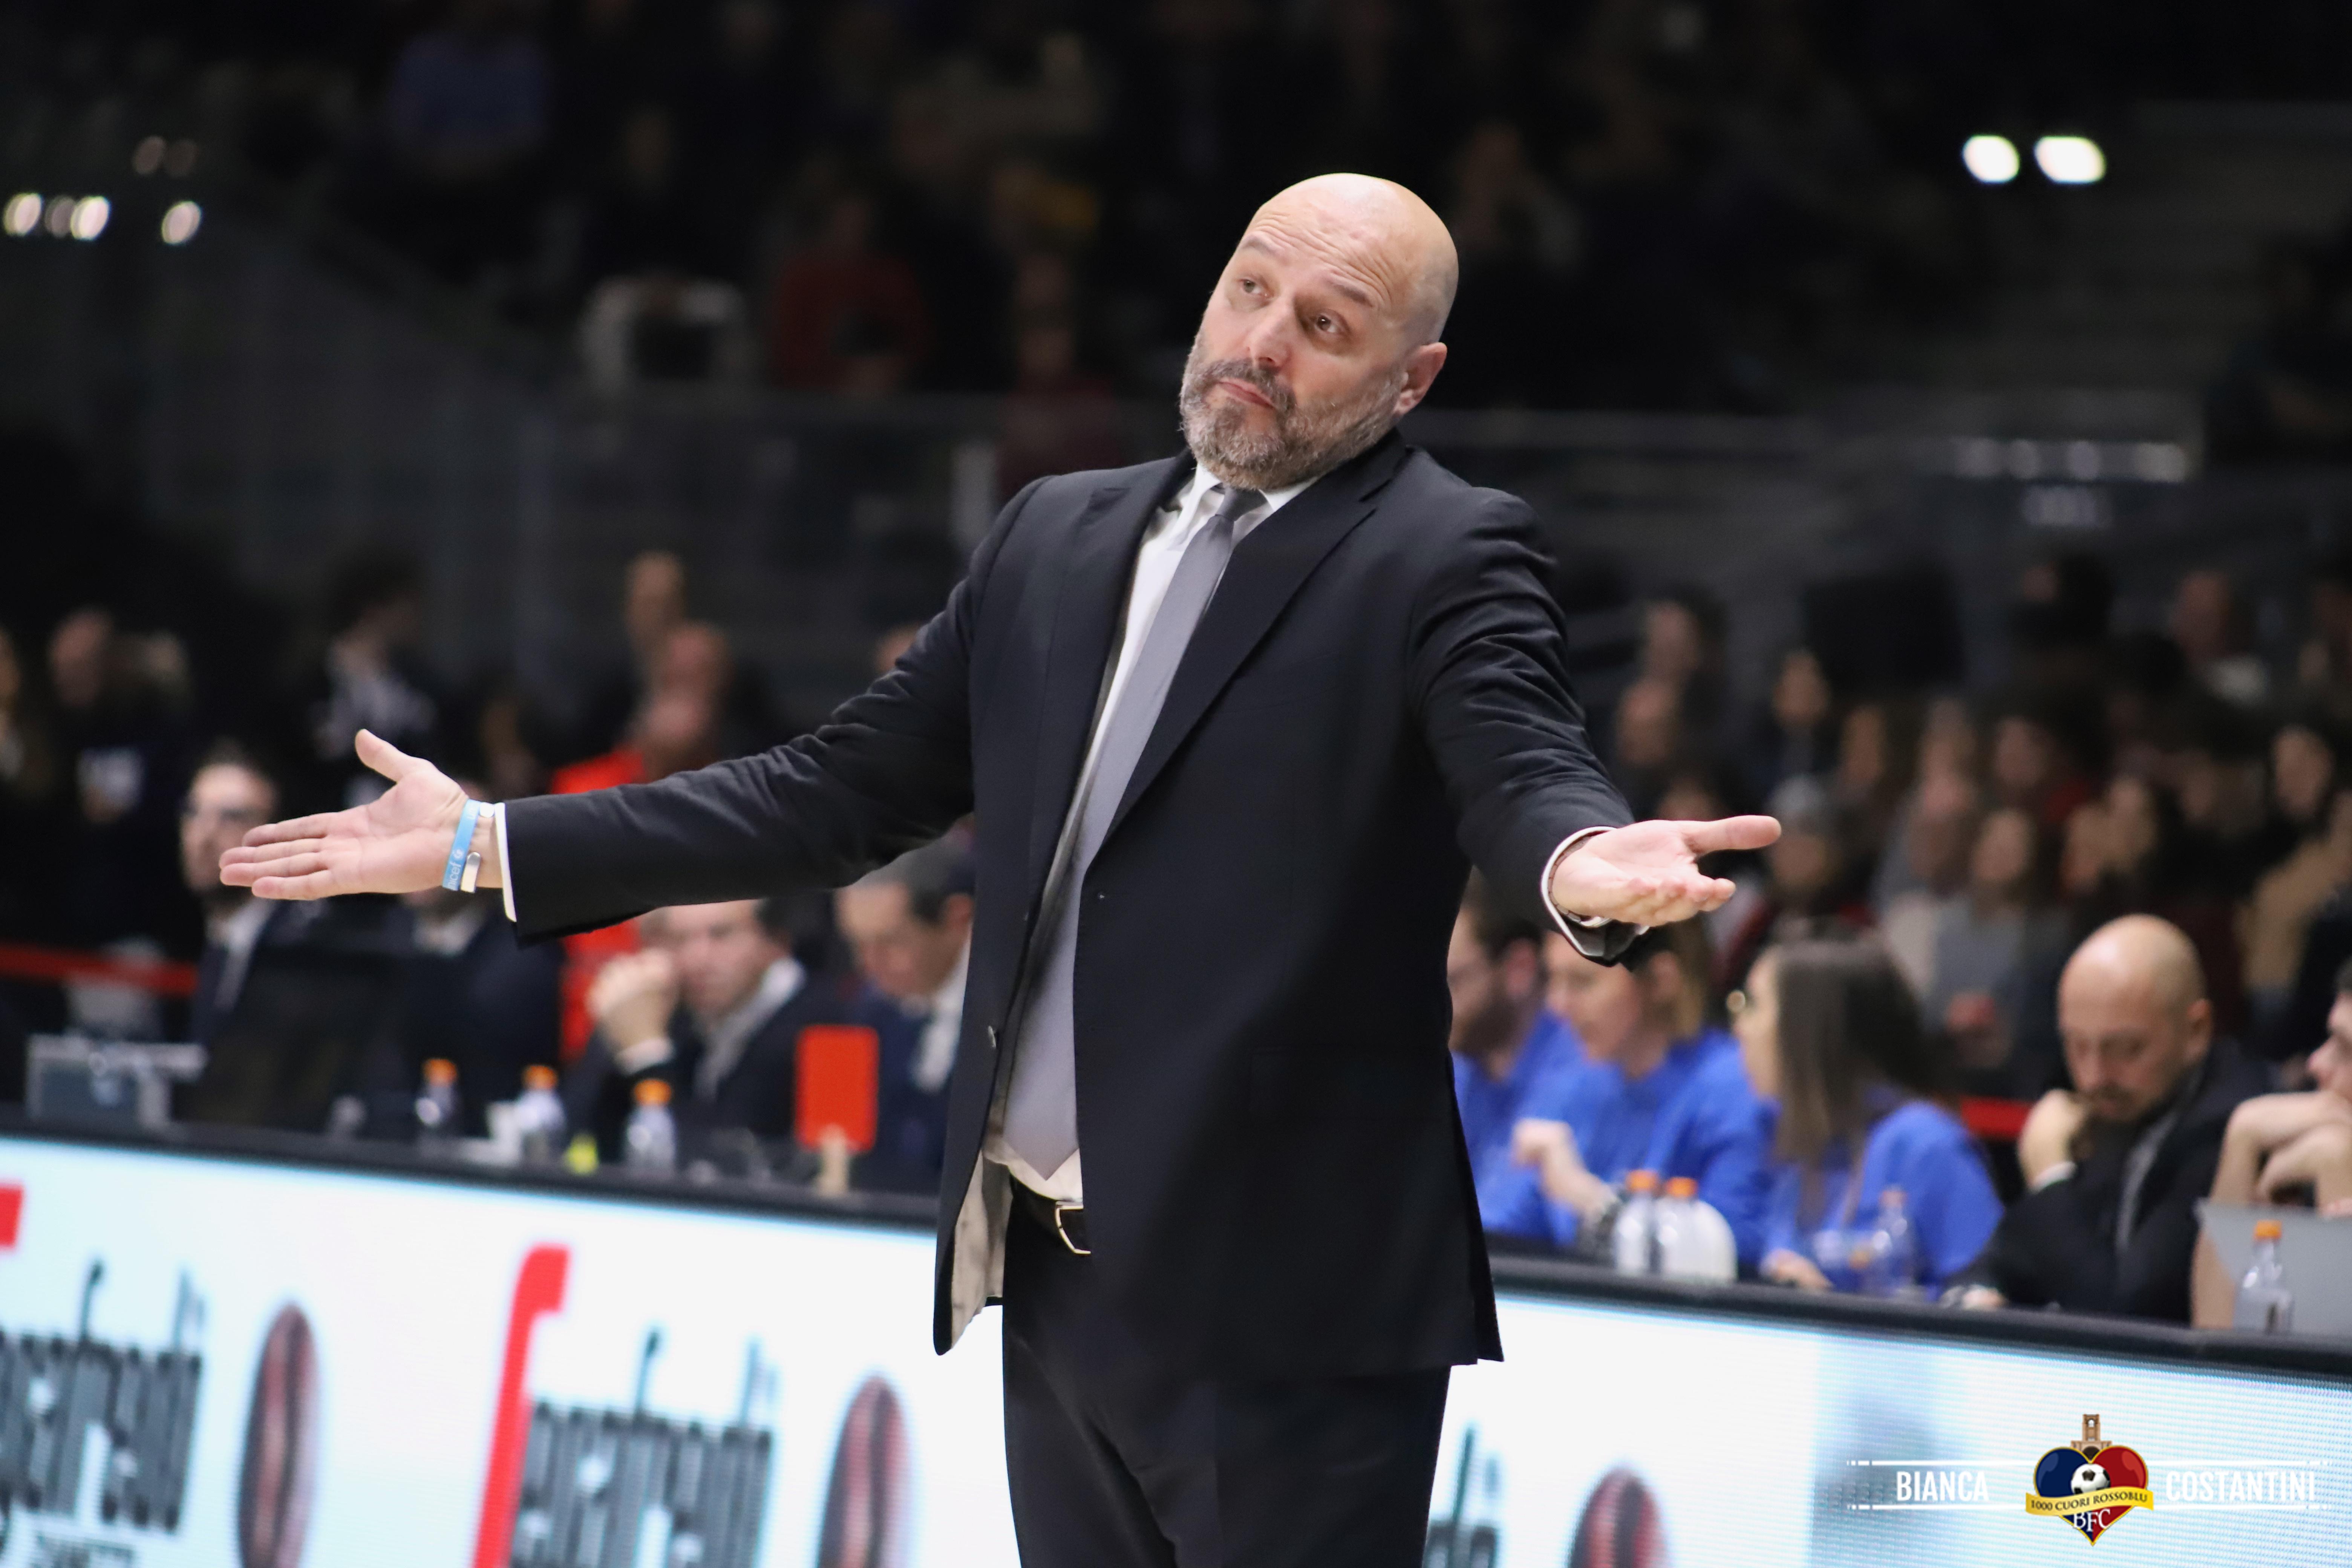 Kazan-Virtus Segafredo, le parole di coach Djordjevic nel post-partita